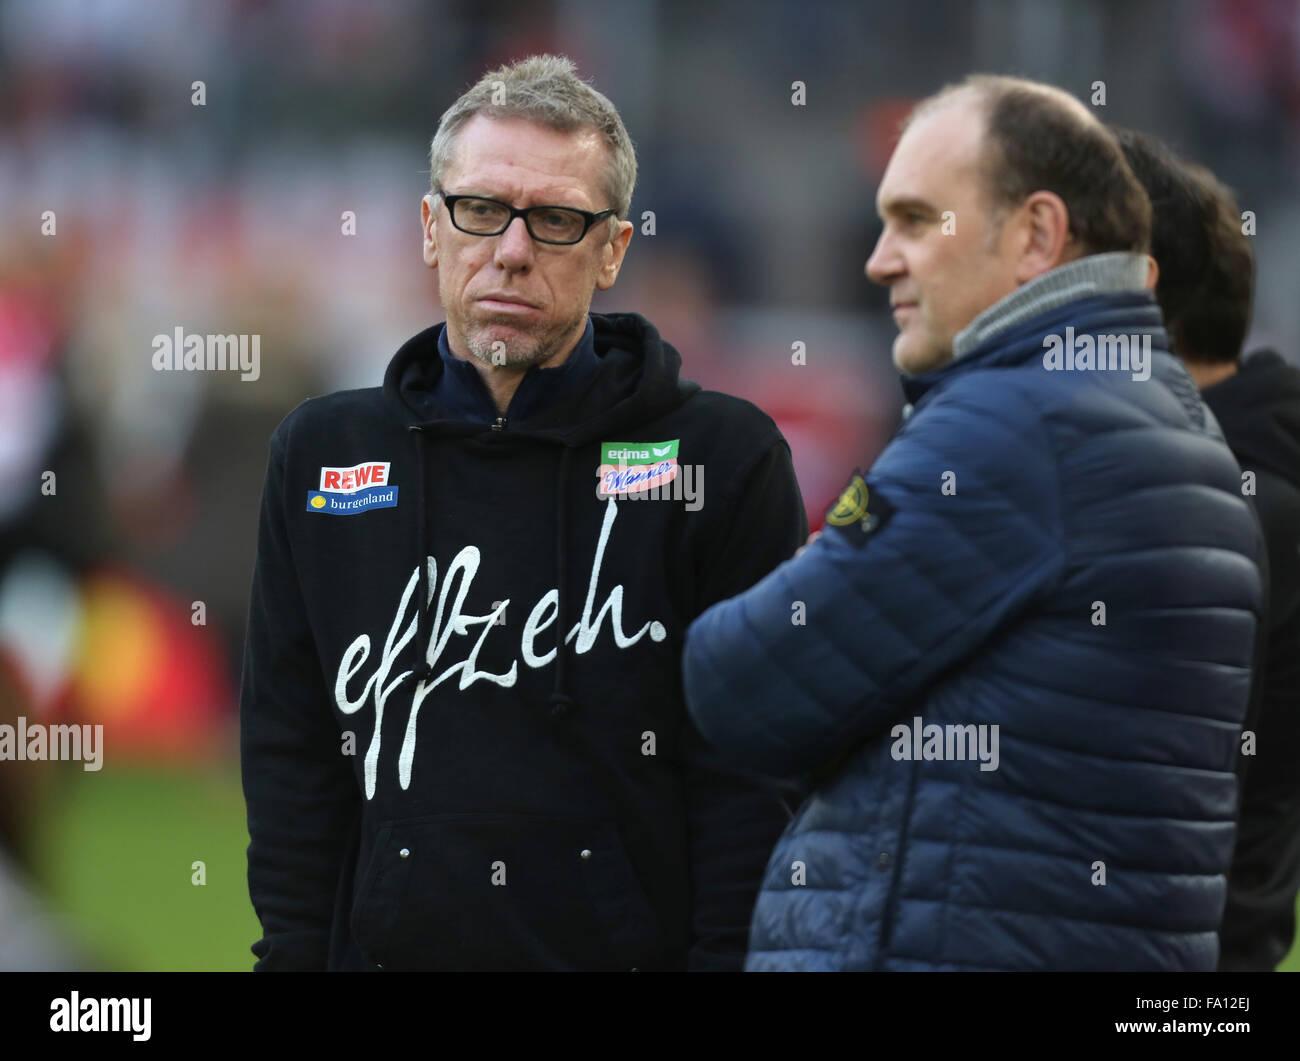 Fussball, 1. Bundesliga, matchday 17, 1. FC Koeln vs Borussia Dortmund, Koeln, 19.12.2015: Manager Peter Stoeger - Stock Image